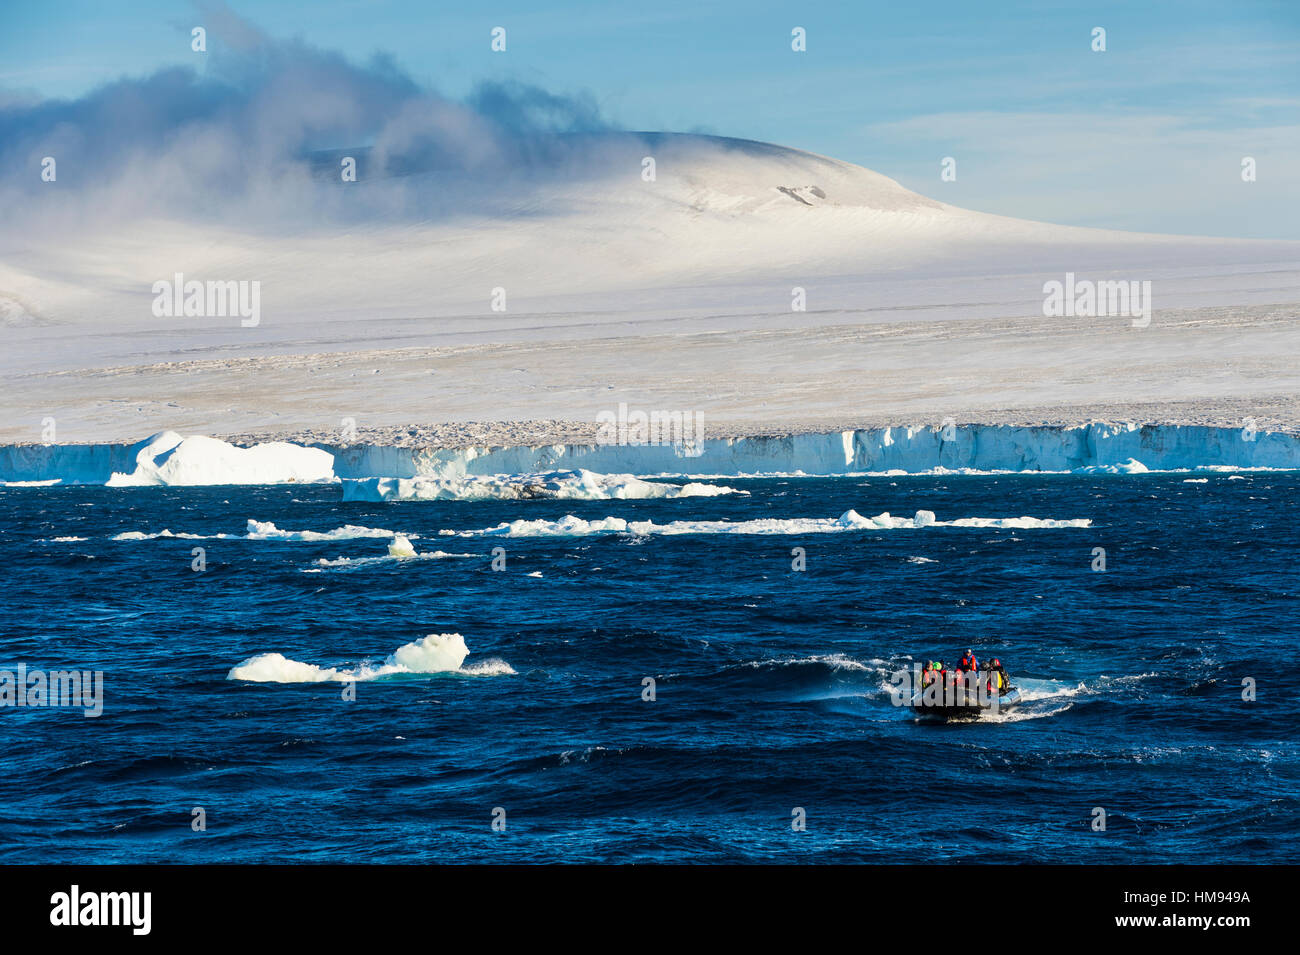 Zodiac with tourists cruising through the icebergs, Brown Bluff, Tabarin Peninsula, Antarctica, Polar Regions - Stock Image